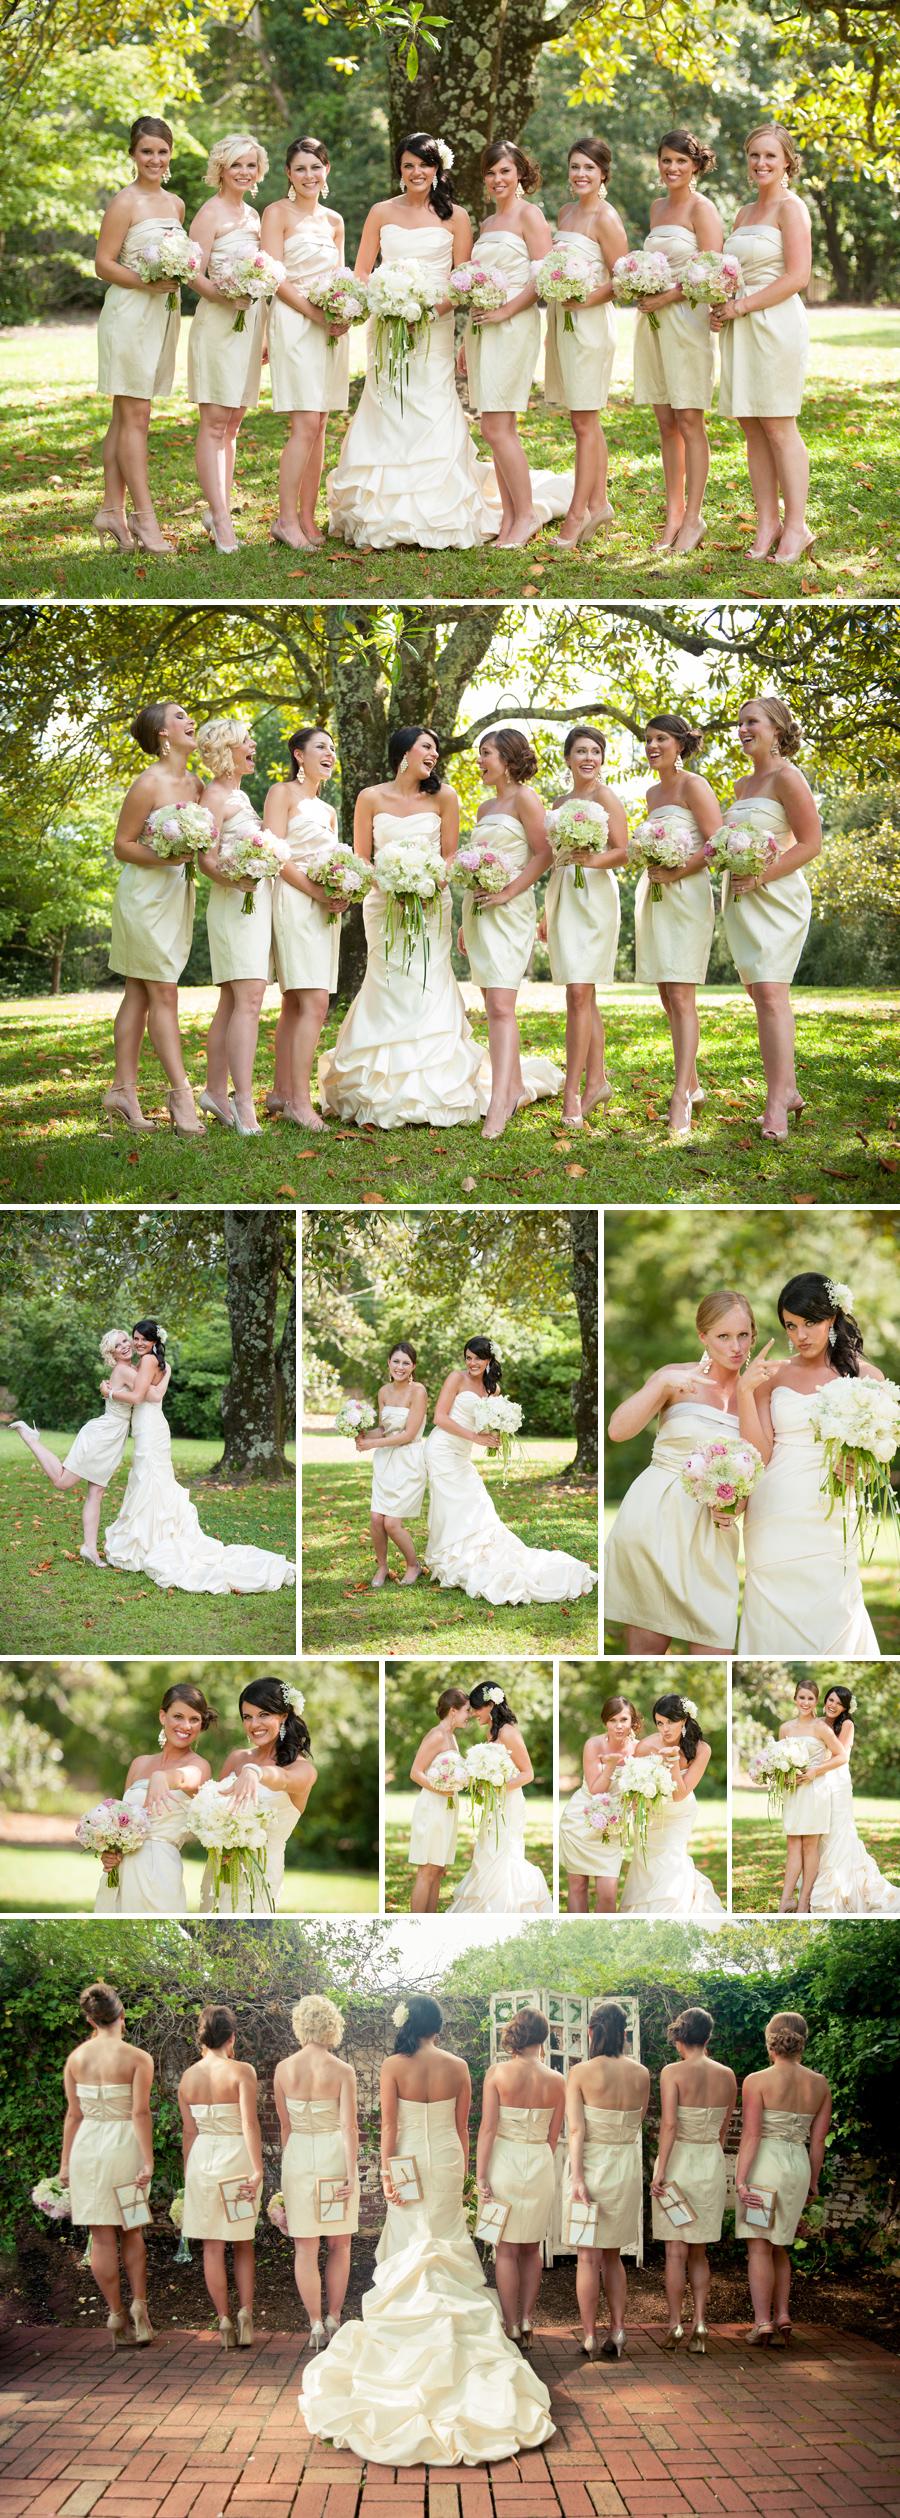 Madison Charles Fairy Tale Wedding At Hopeland Gardens